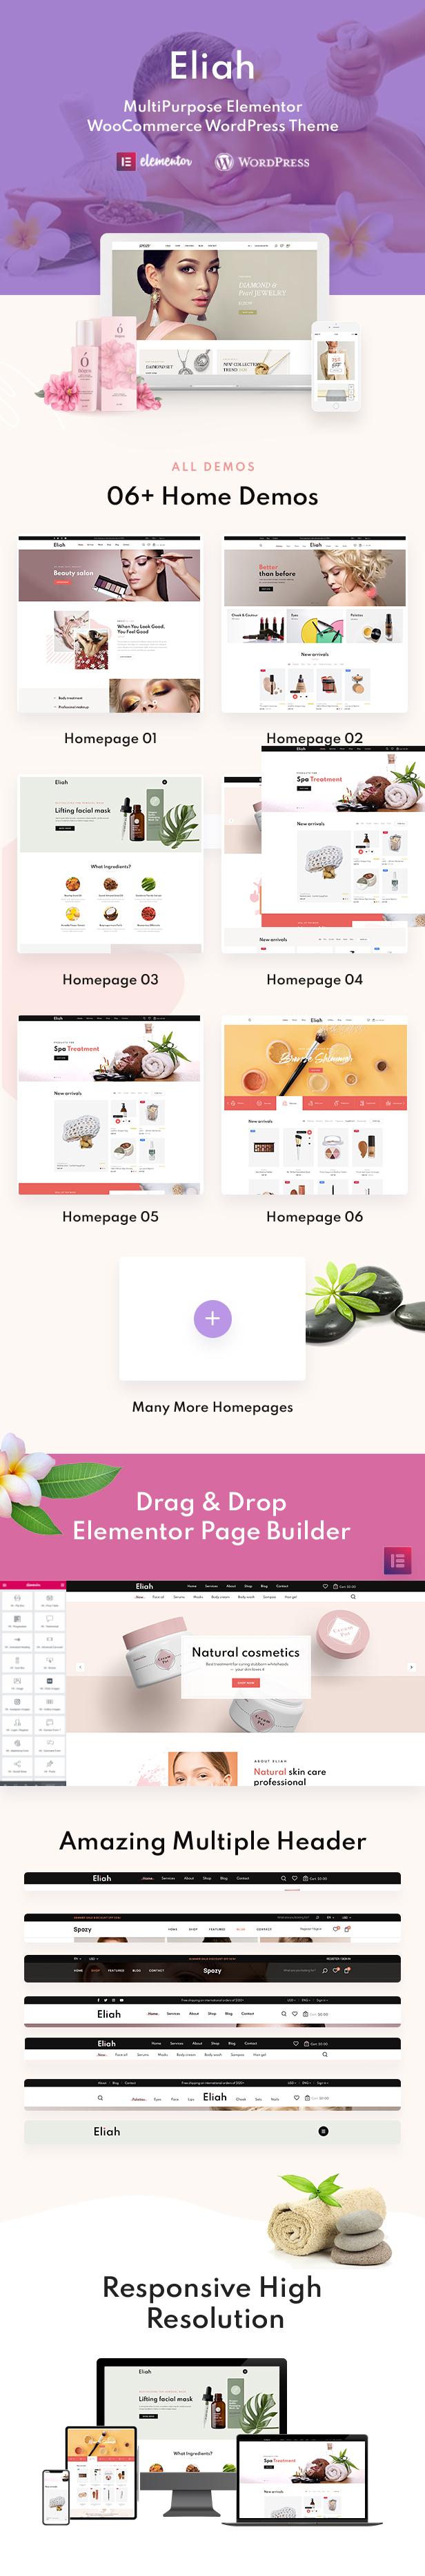 Eliah - WooCommerce WordPress Theme - 1